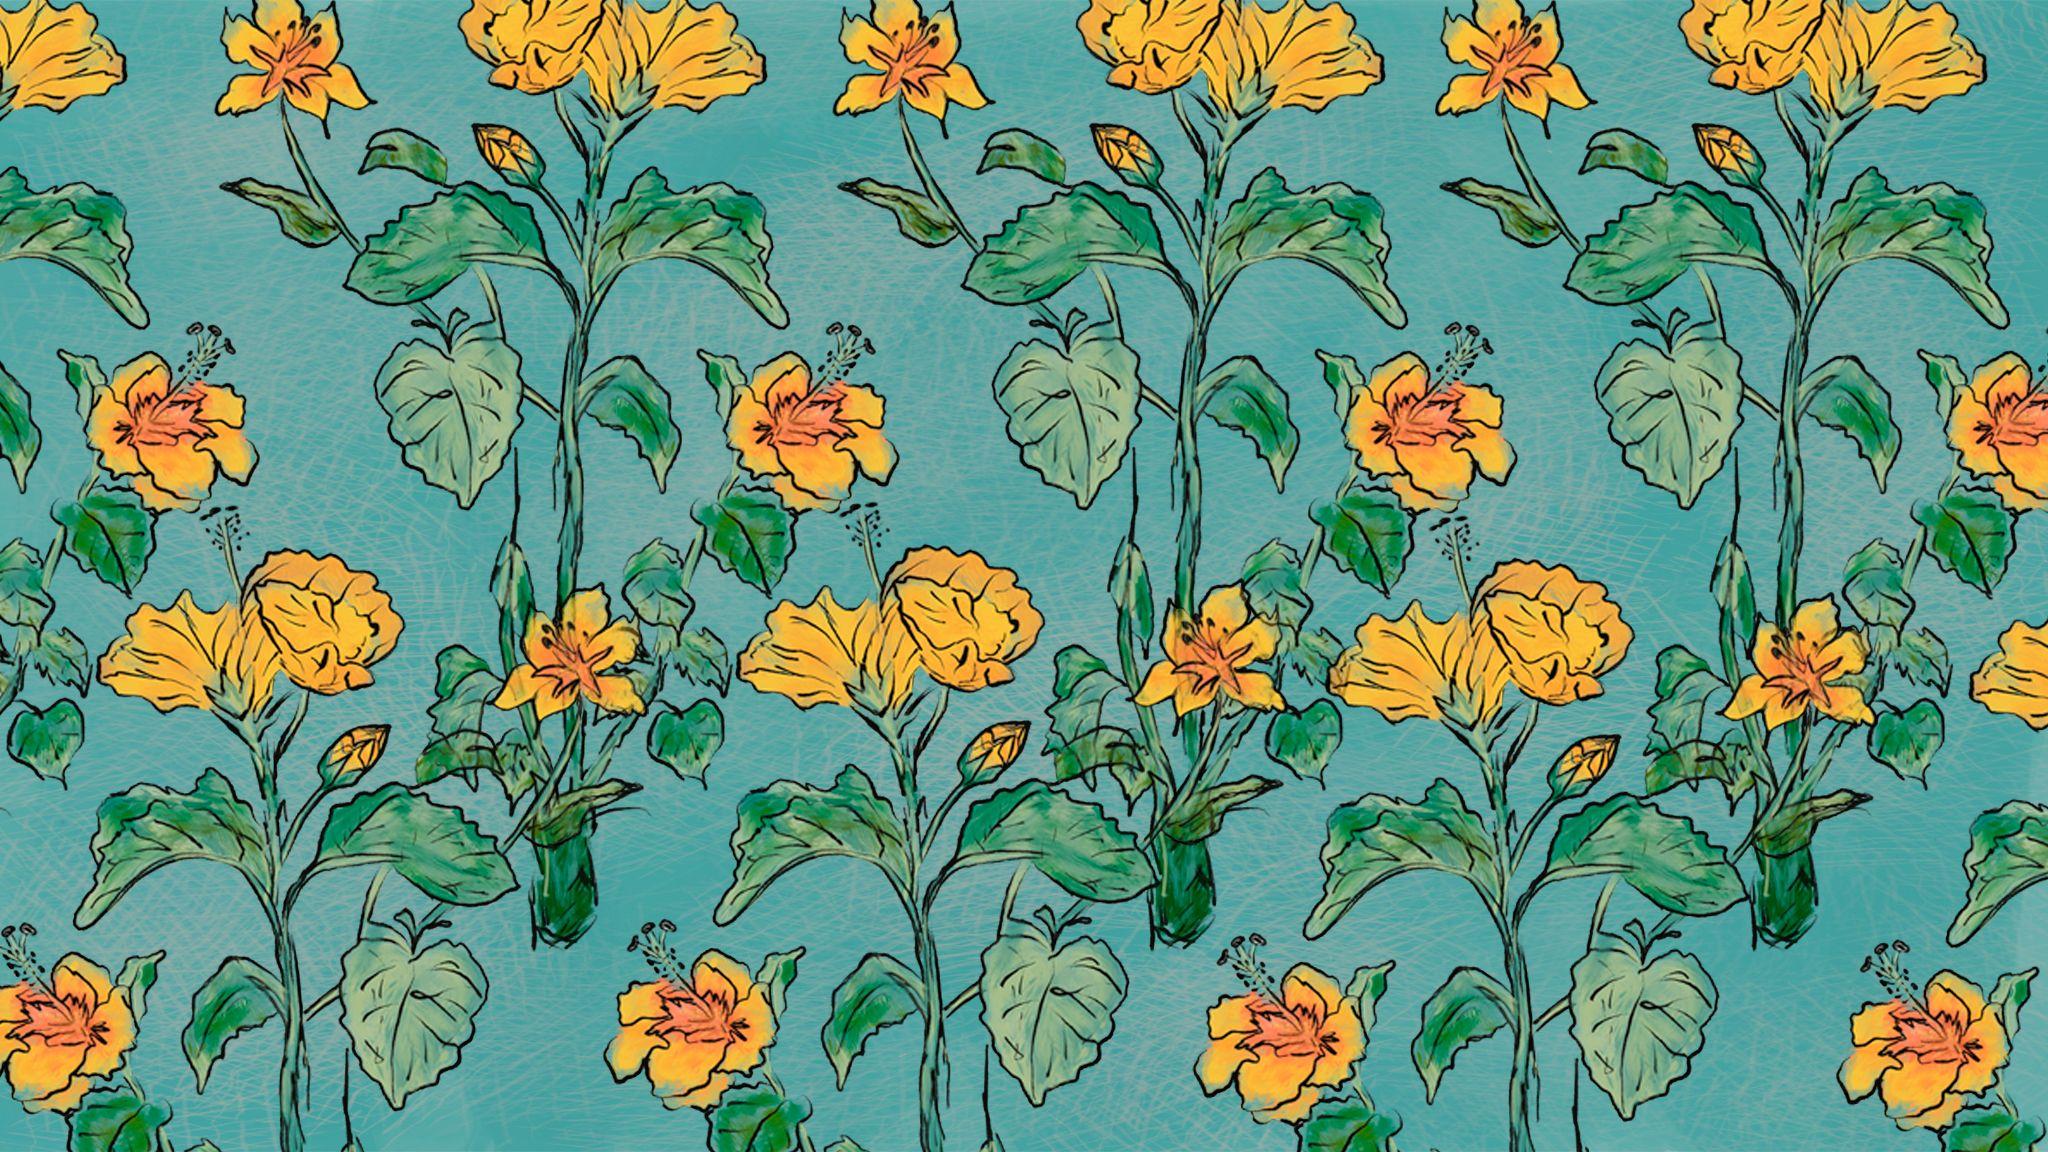 Download hd wallpapers for free on unsplash. Yellow Hibiscus Wallpaper — Moncharis | Desktop wallpaper